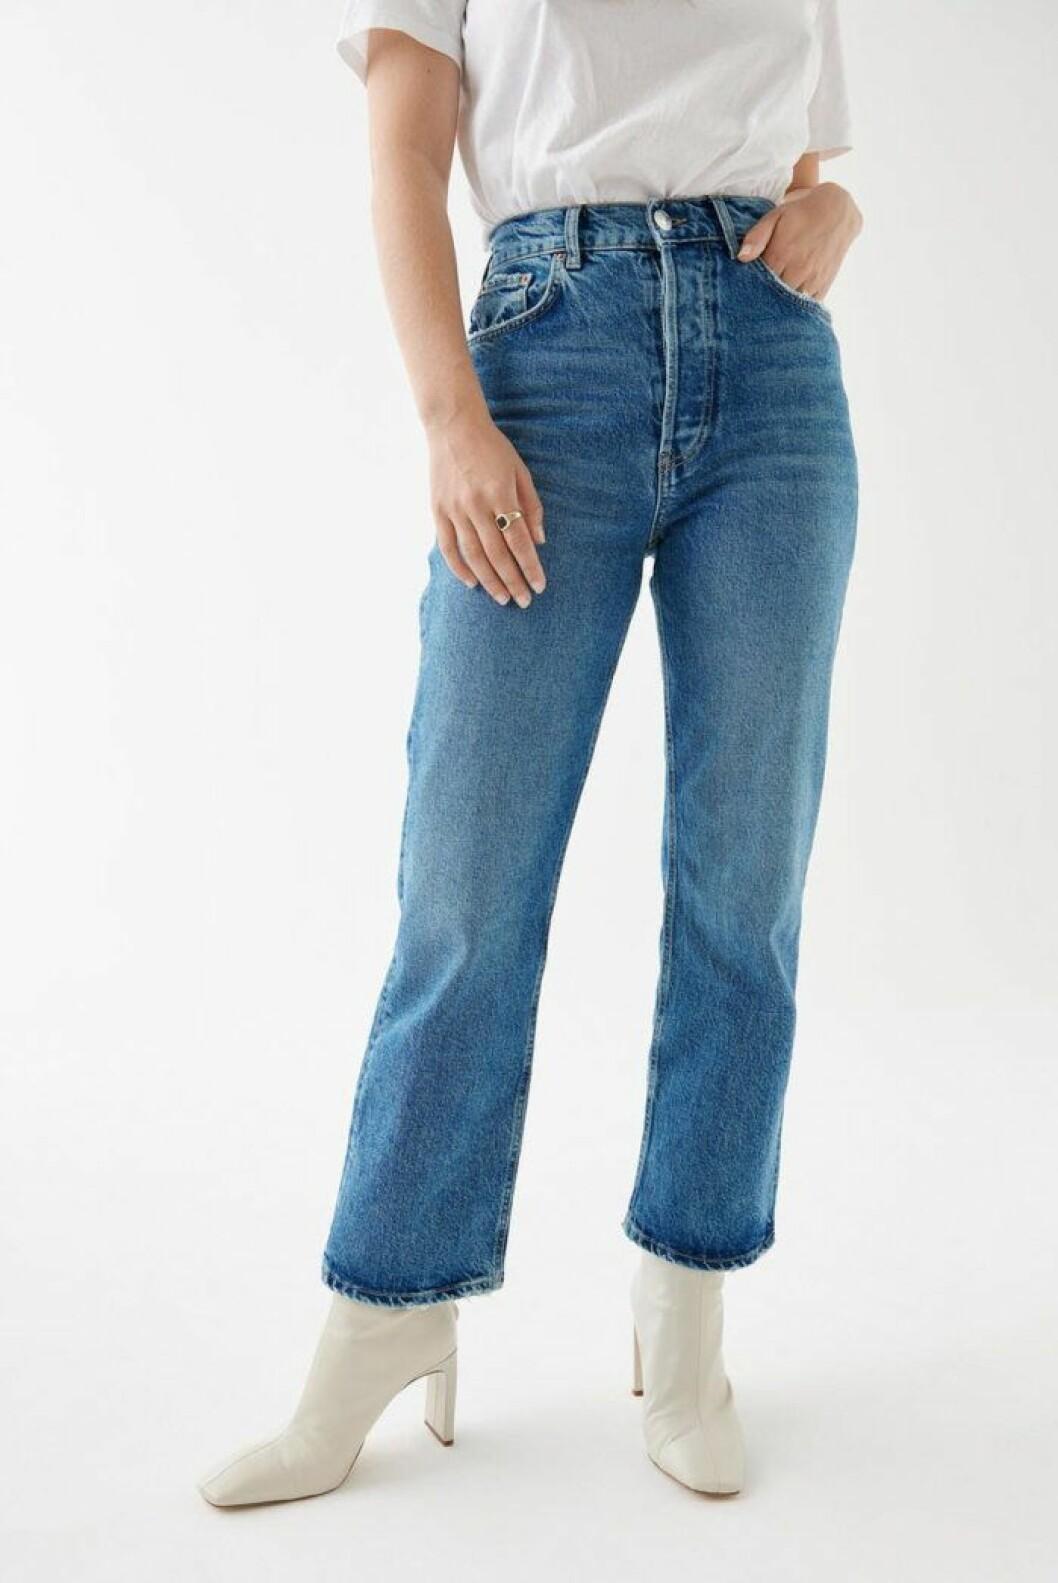 Croppade jeans från gina tricot